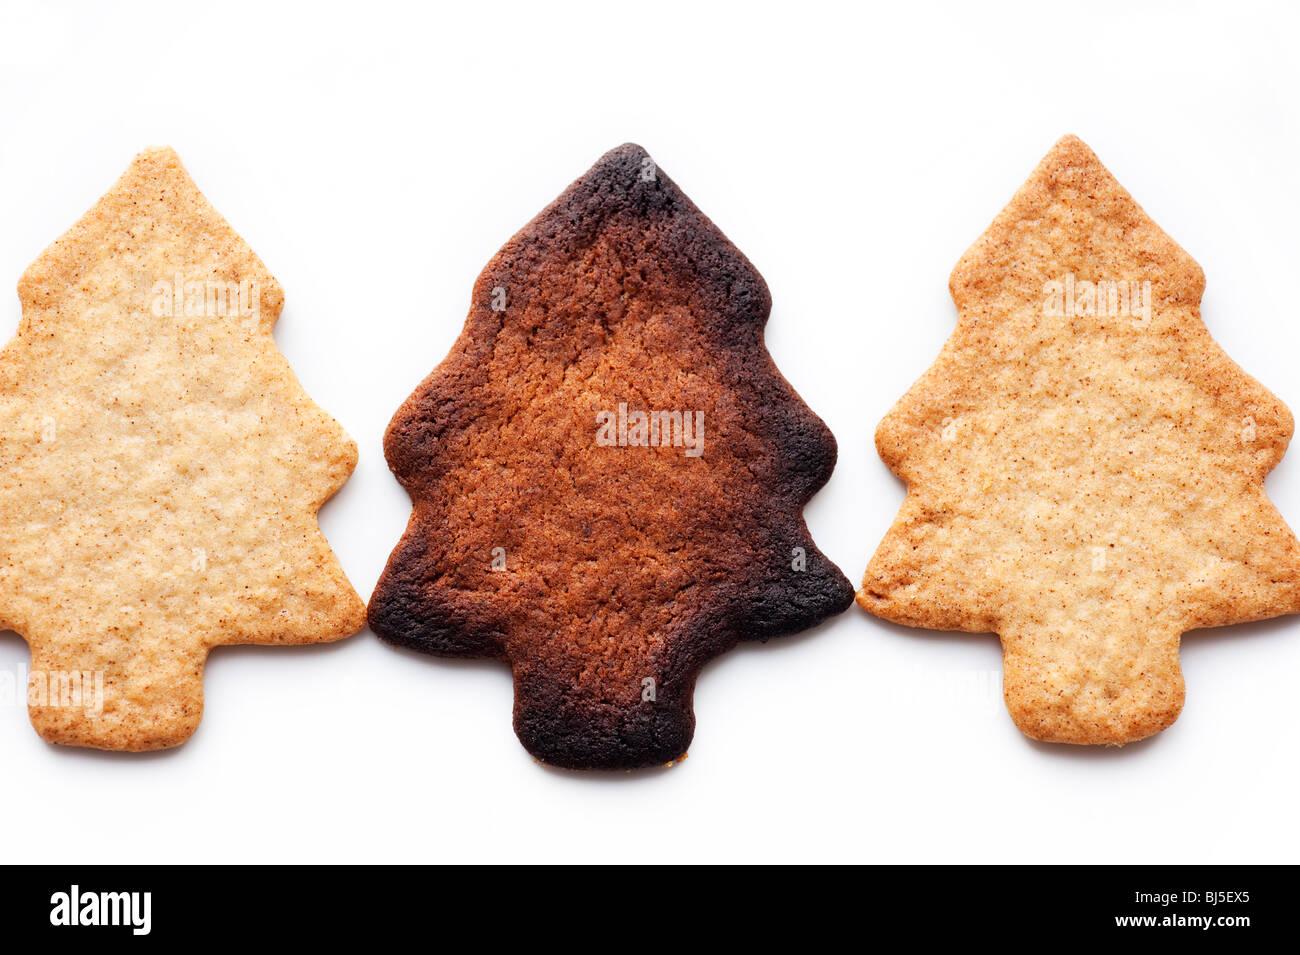 Three Cinnamon Christmas Tree Shaped Cookies One Burnt Stock Photo